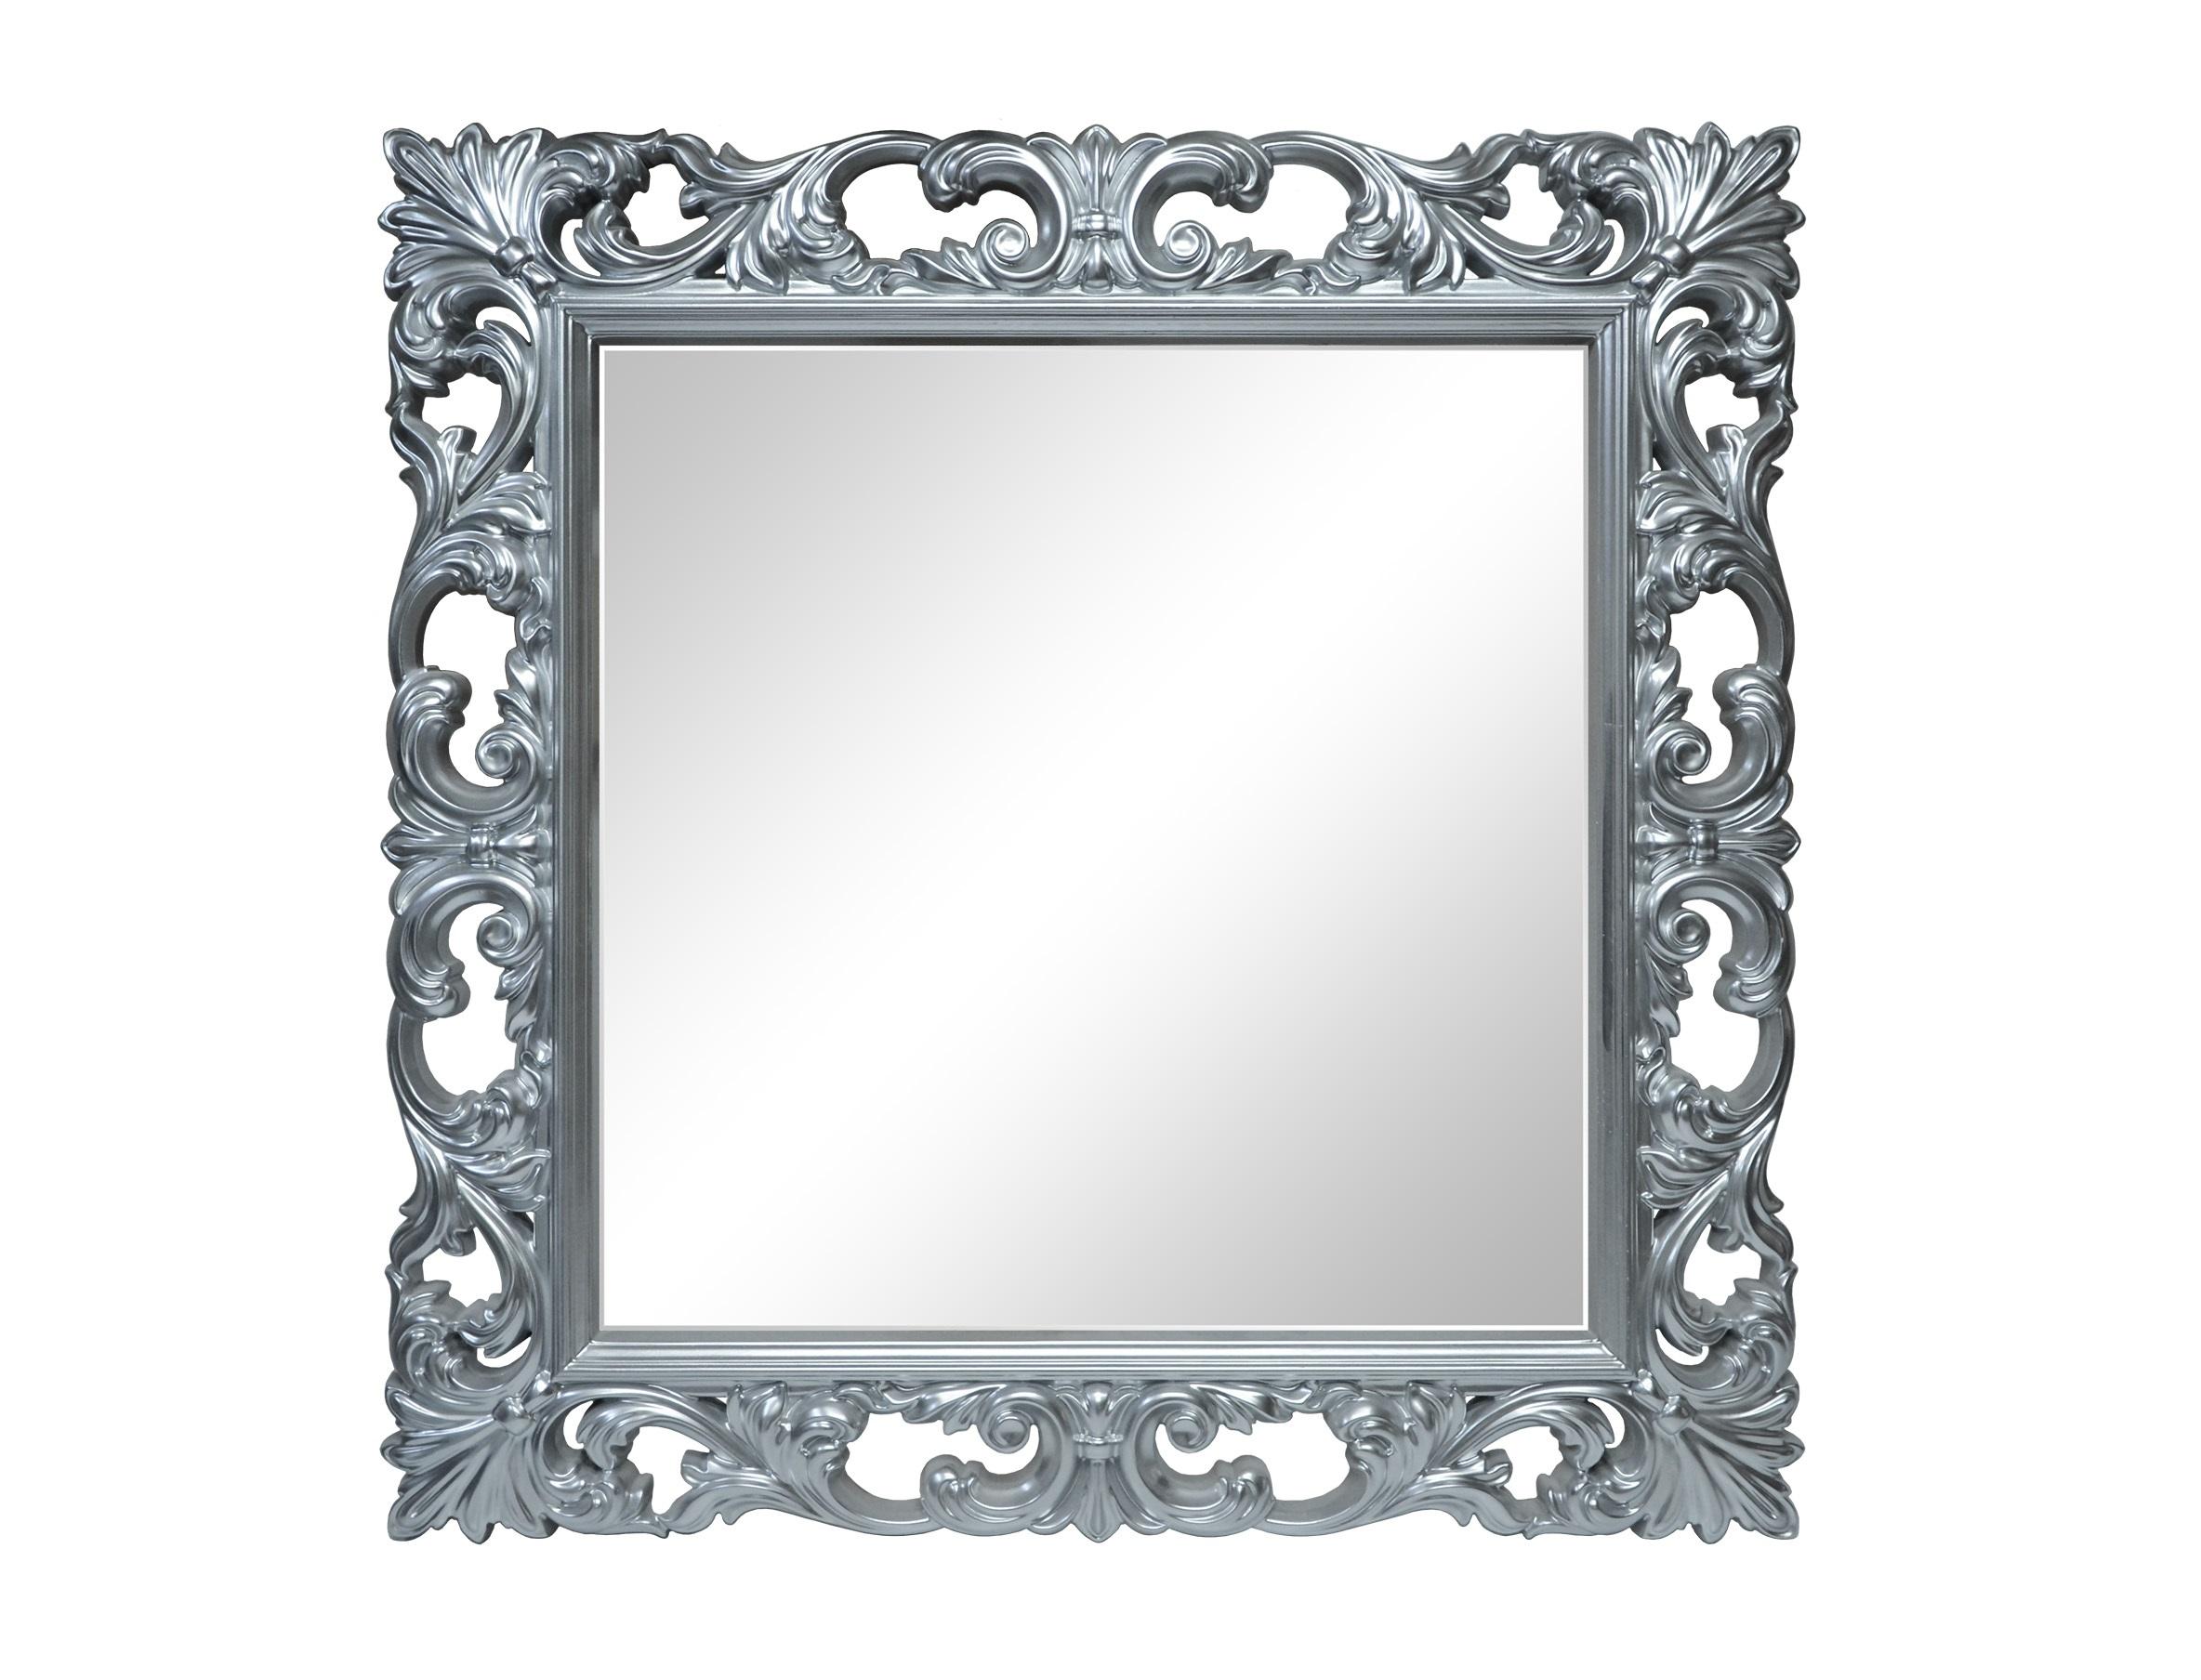 Зеркало Reeforma 15432717 от thefurnish